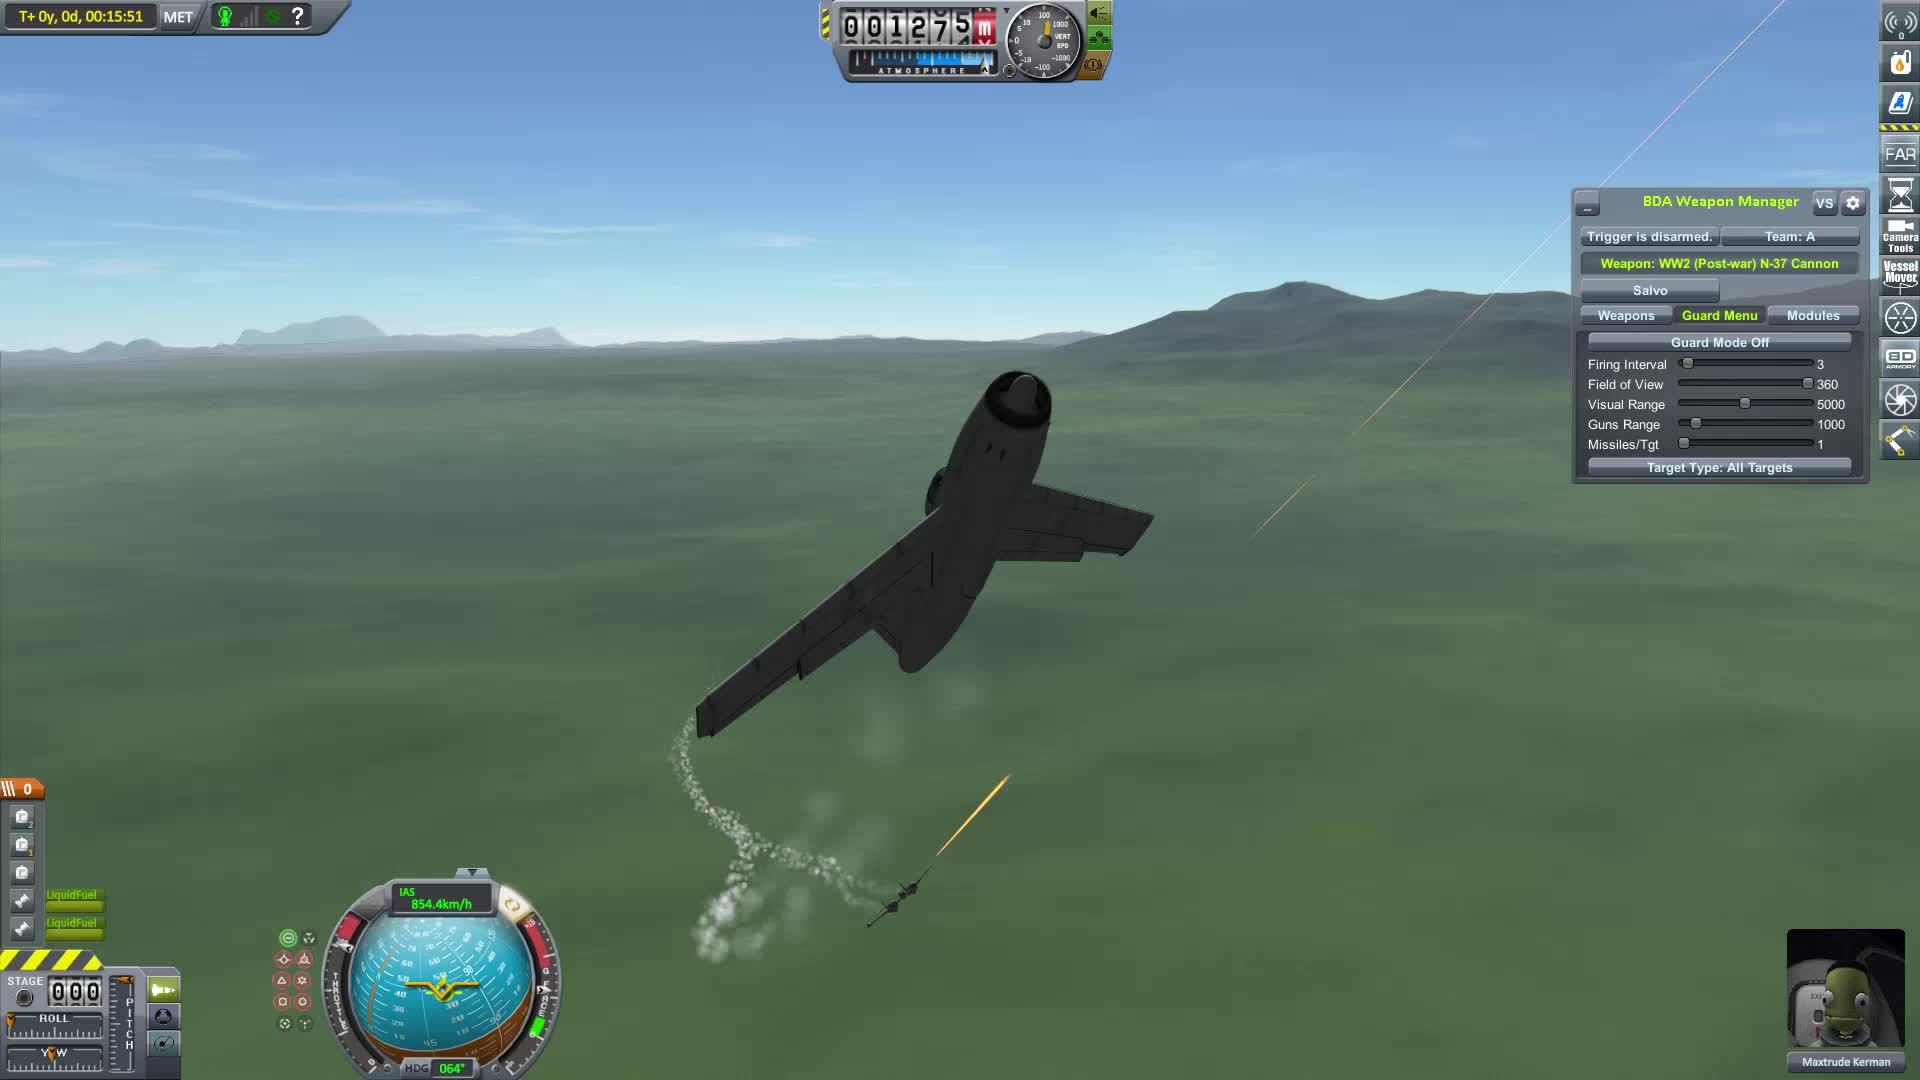 BDArmoury, Dogfight, KSP, Kerbal Space Program, La-200 vs Turbo Lightning GIFs